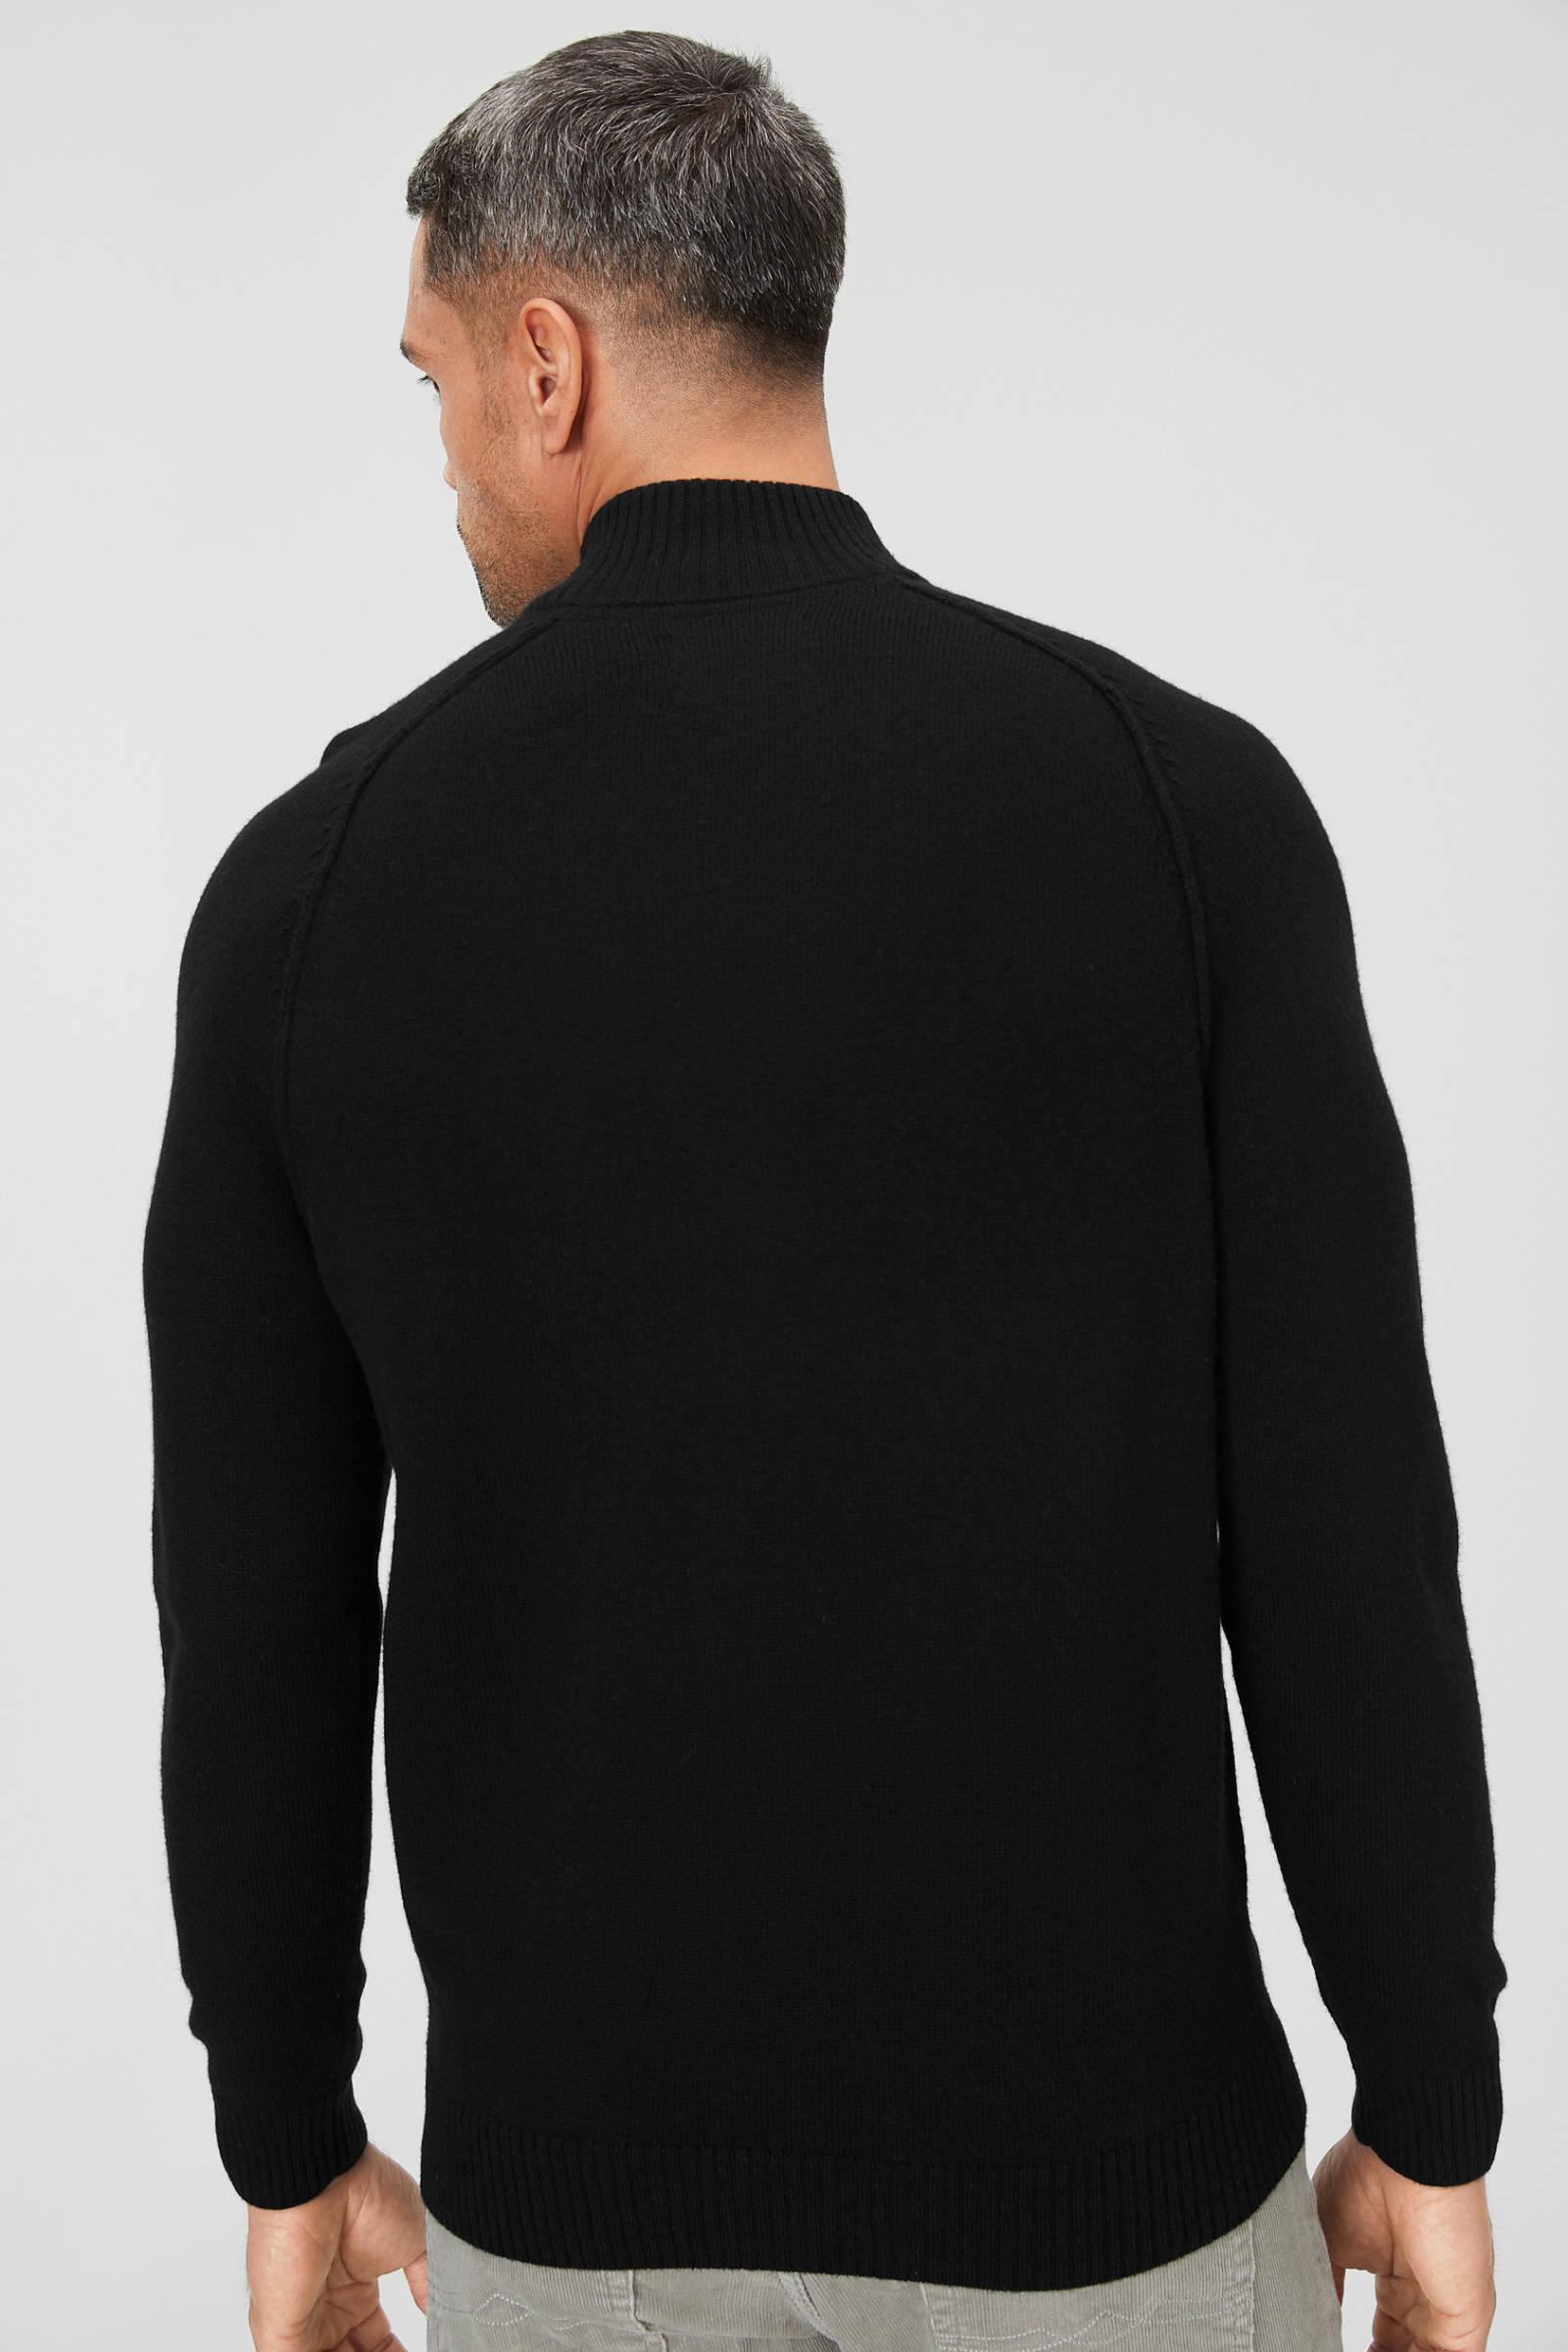 C&A Canda trui zwarte melee | wehkamp